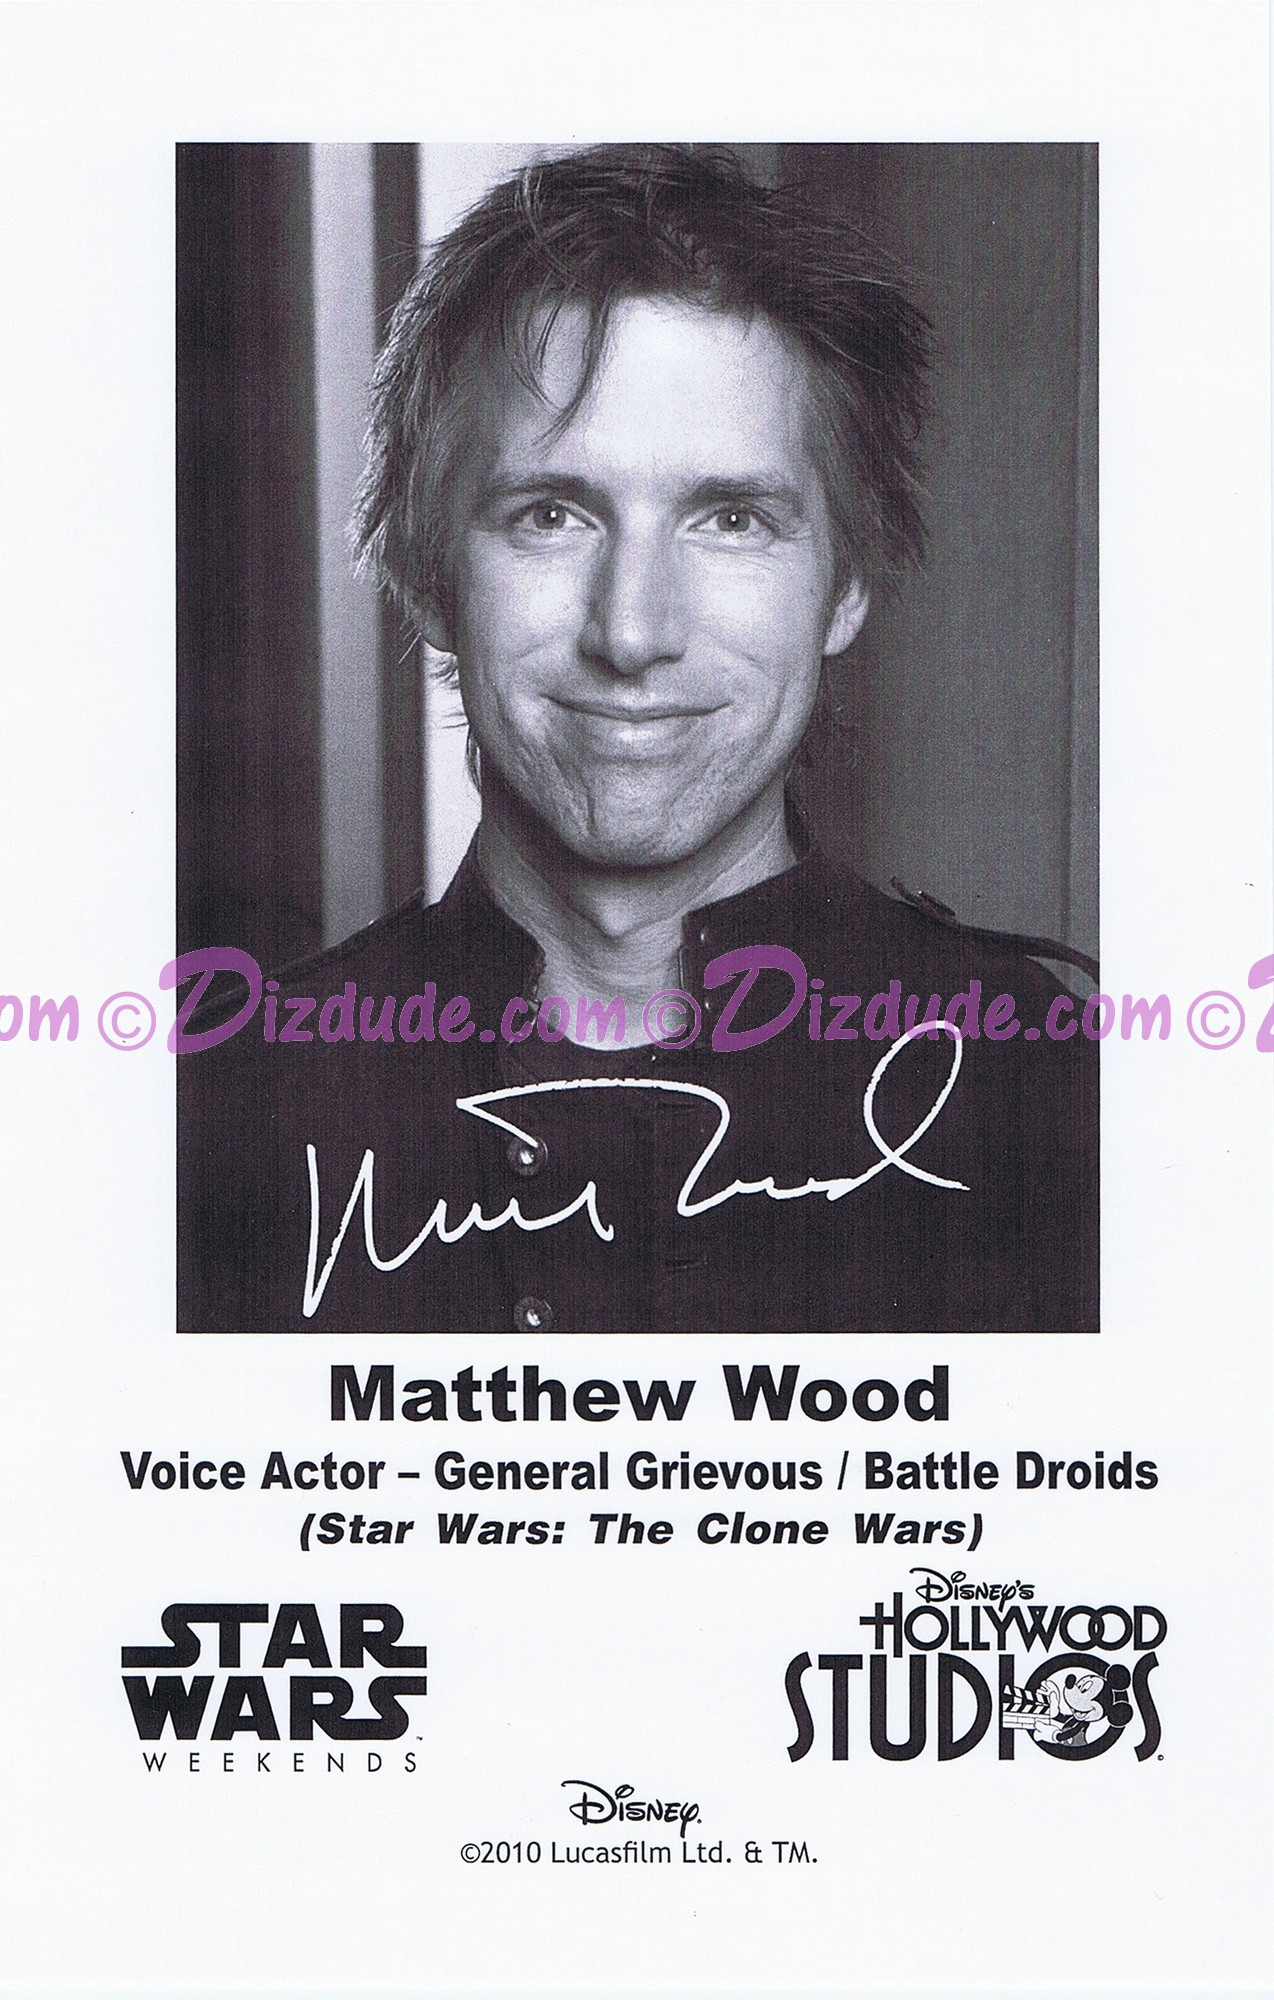 Matthew Wood the voice of General Grievous & Battle Droids Presigned Official Star Wars Weekends 2010 Celebrity Collector Photo © Dizdude.com